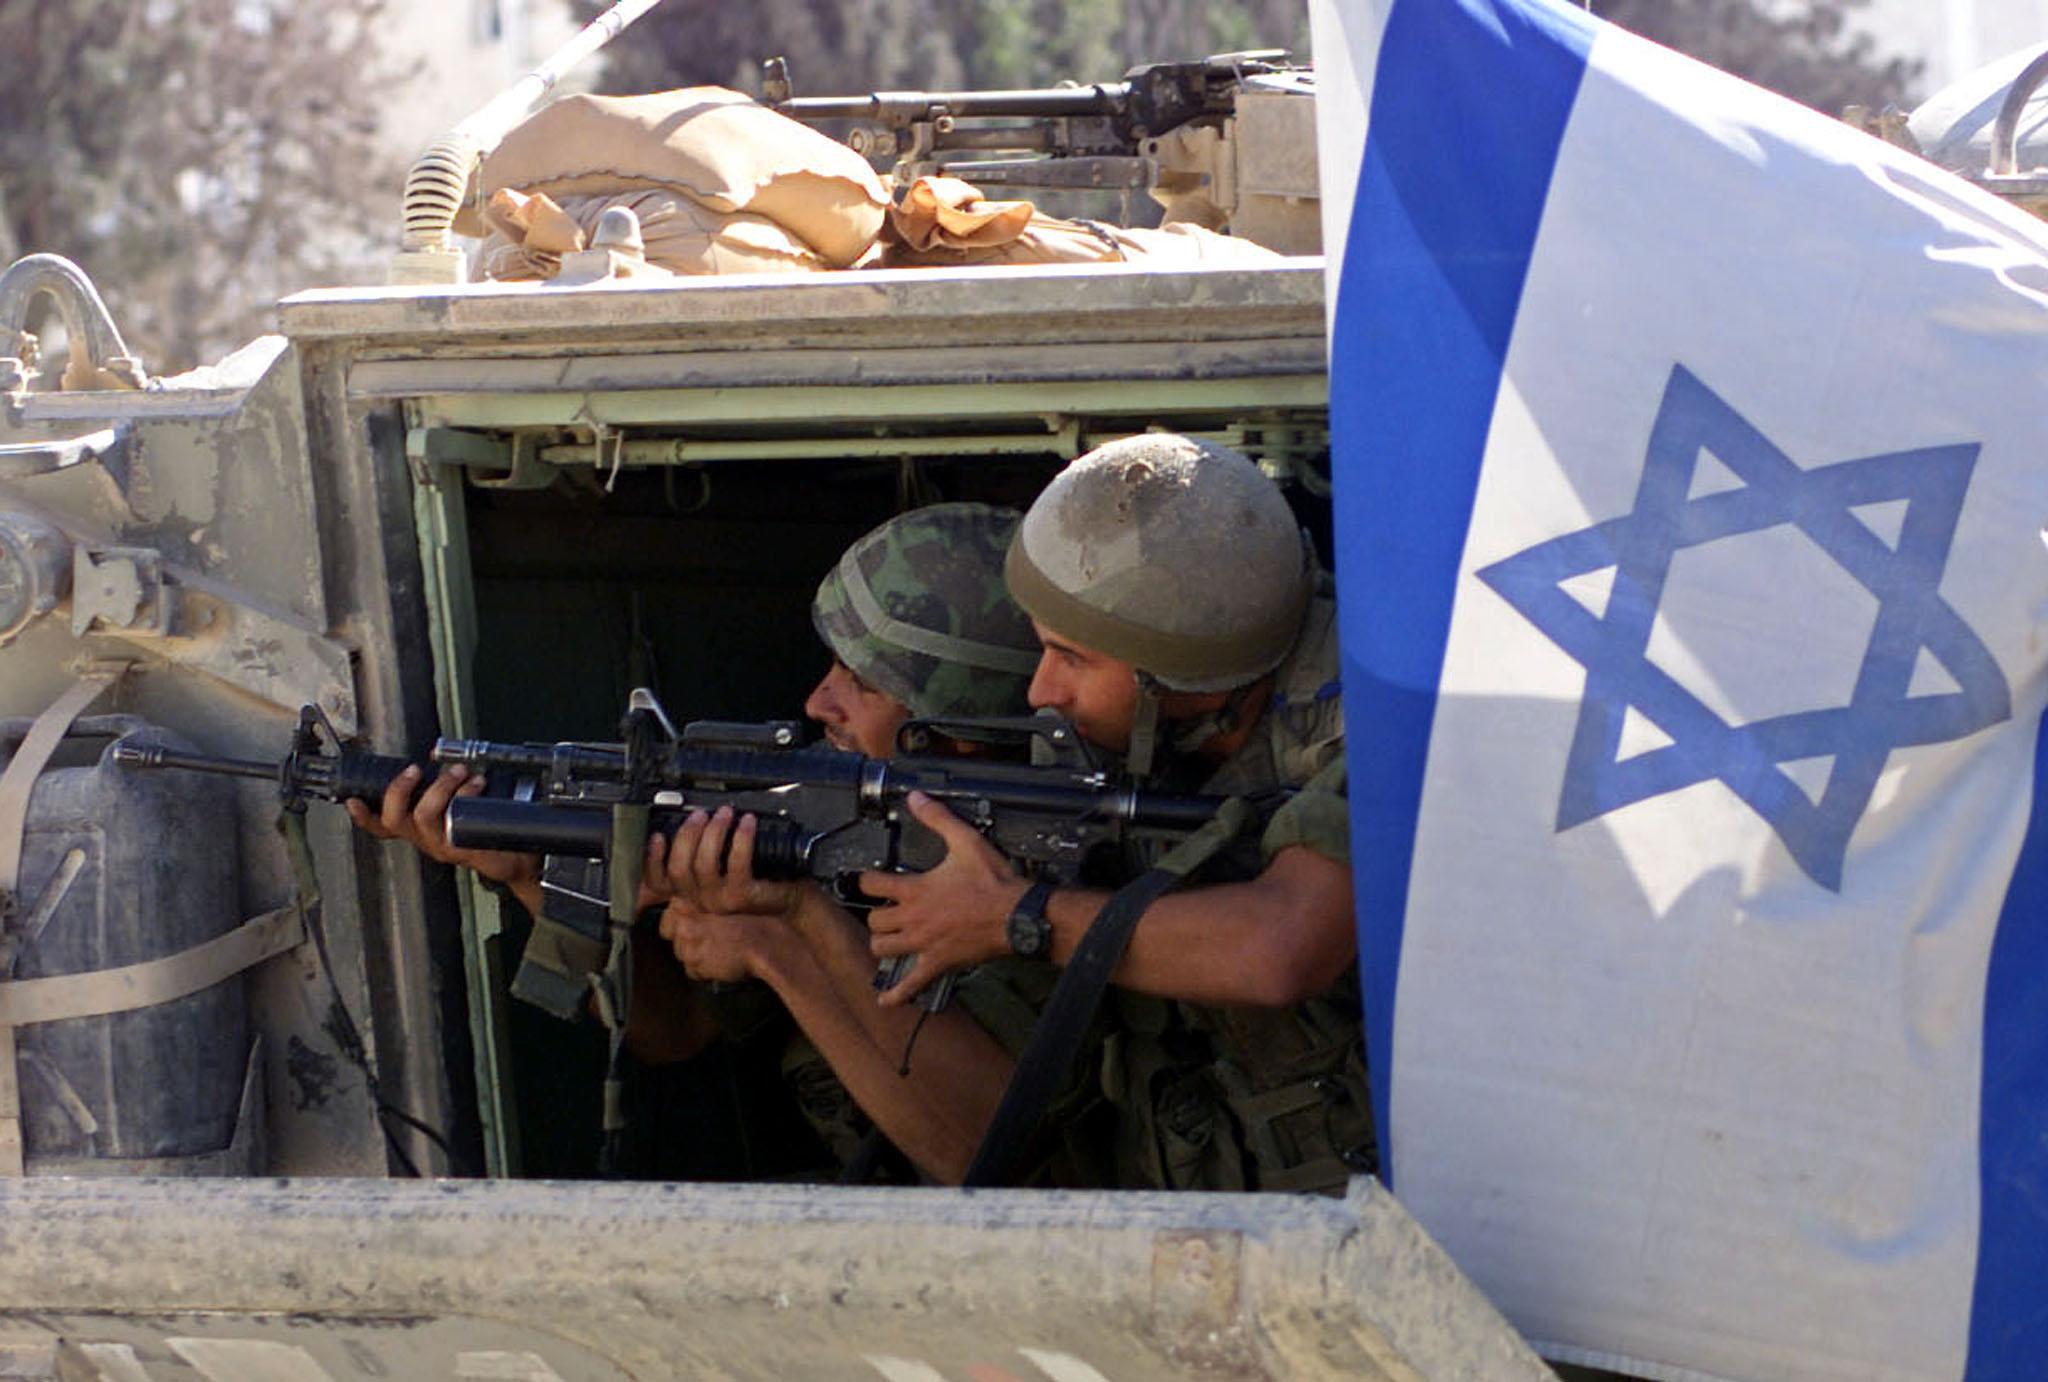 ISRAELI SOLDIERS PREPARE TO SHOOT TEARGAS GRENADES AT PALESTINIAN BOYS IN BETHLEHEM'S DEHEISHE REFUGEE CAMP